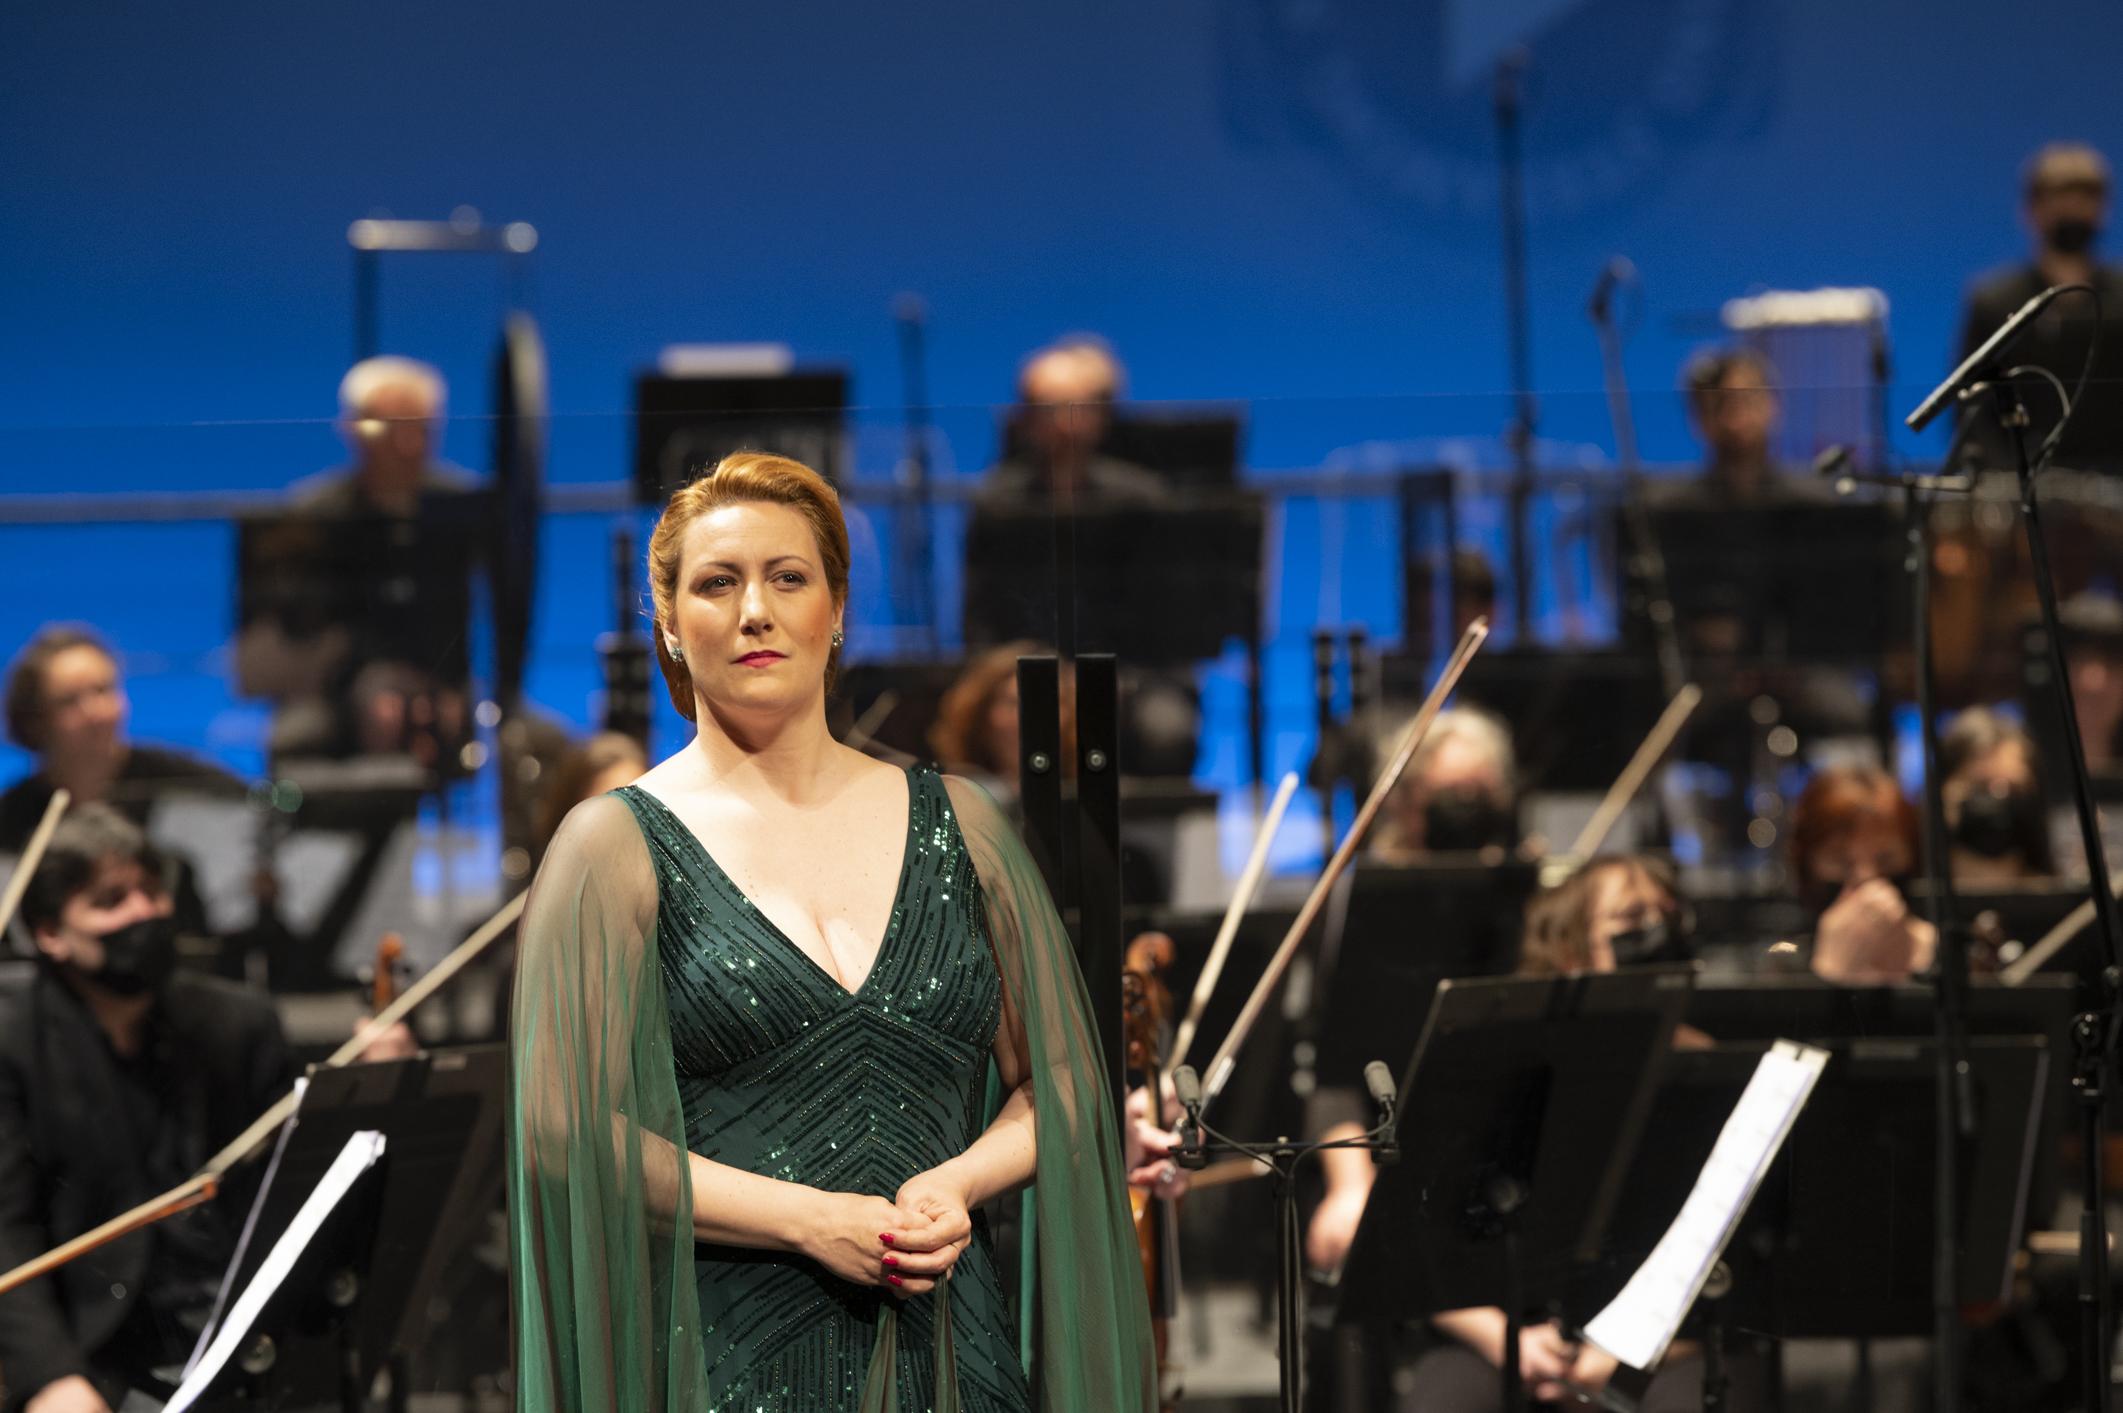 Opéra Royal de Wallonie-Liège, Orchestre de Daniel Oren & Saioa Hernández